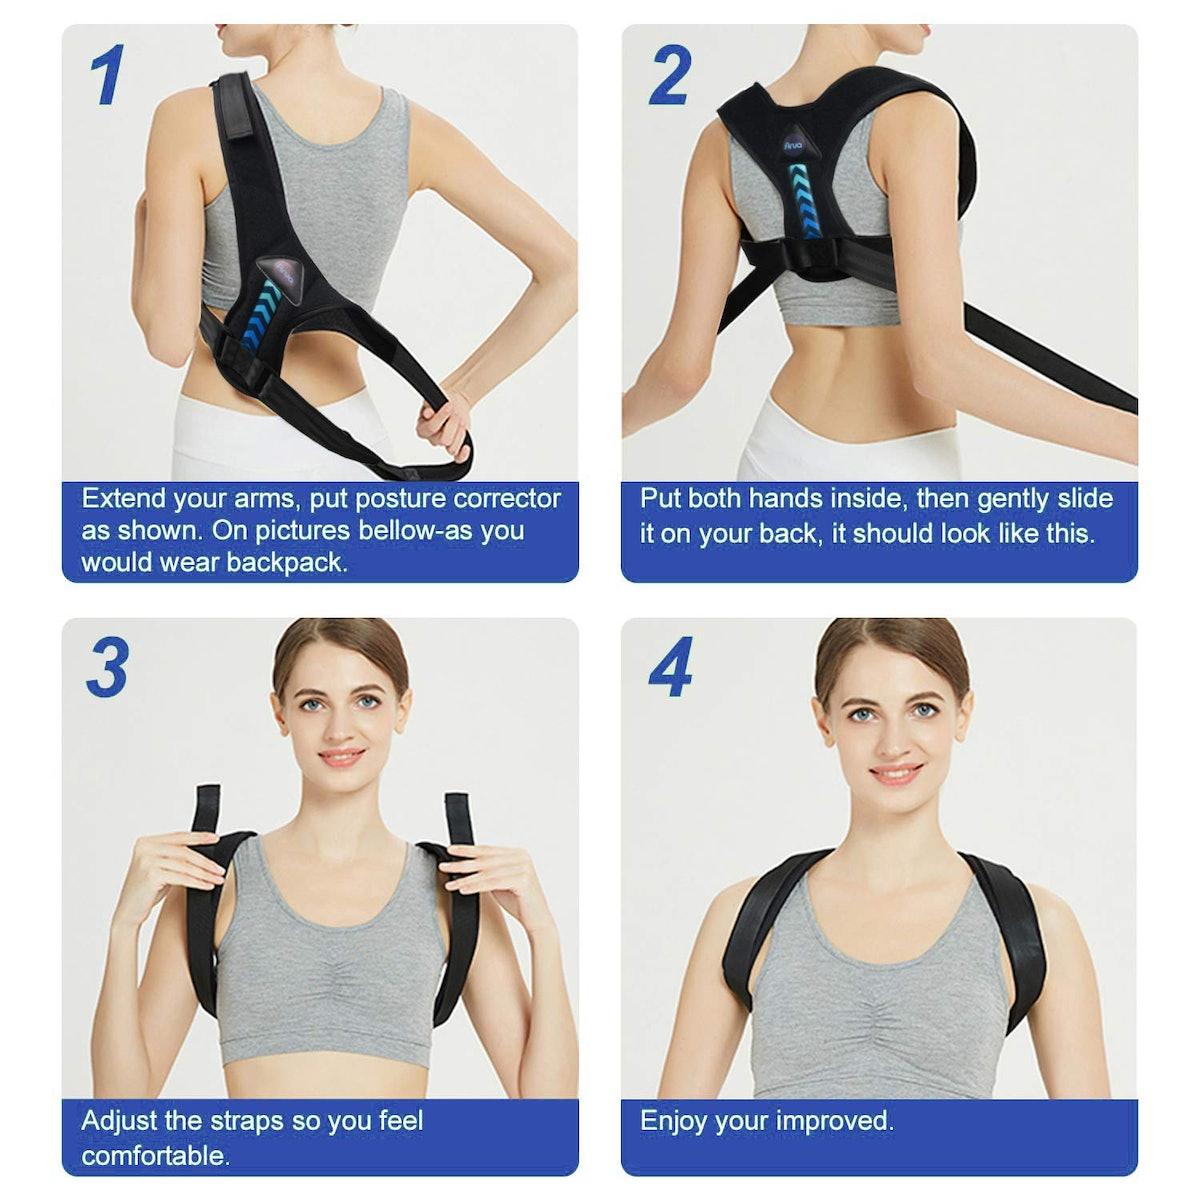 Arua Posture Corrector